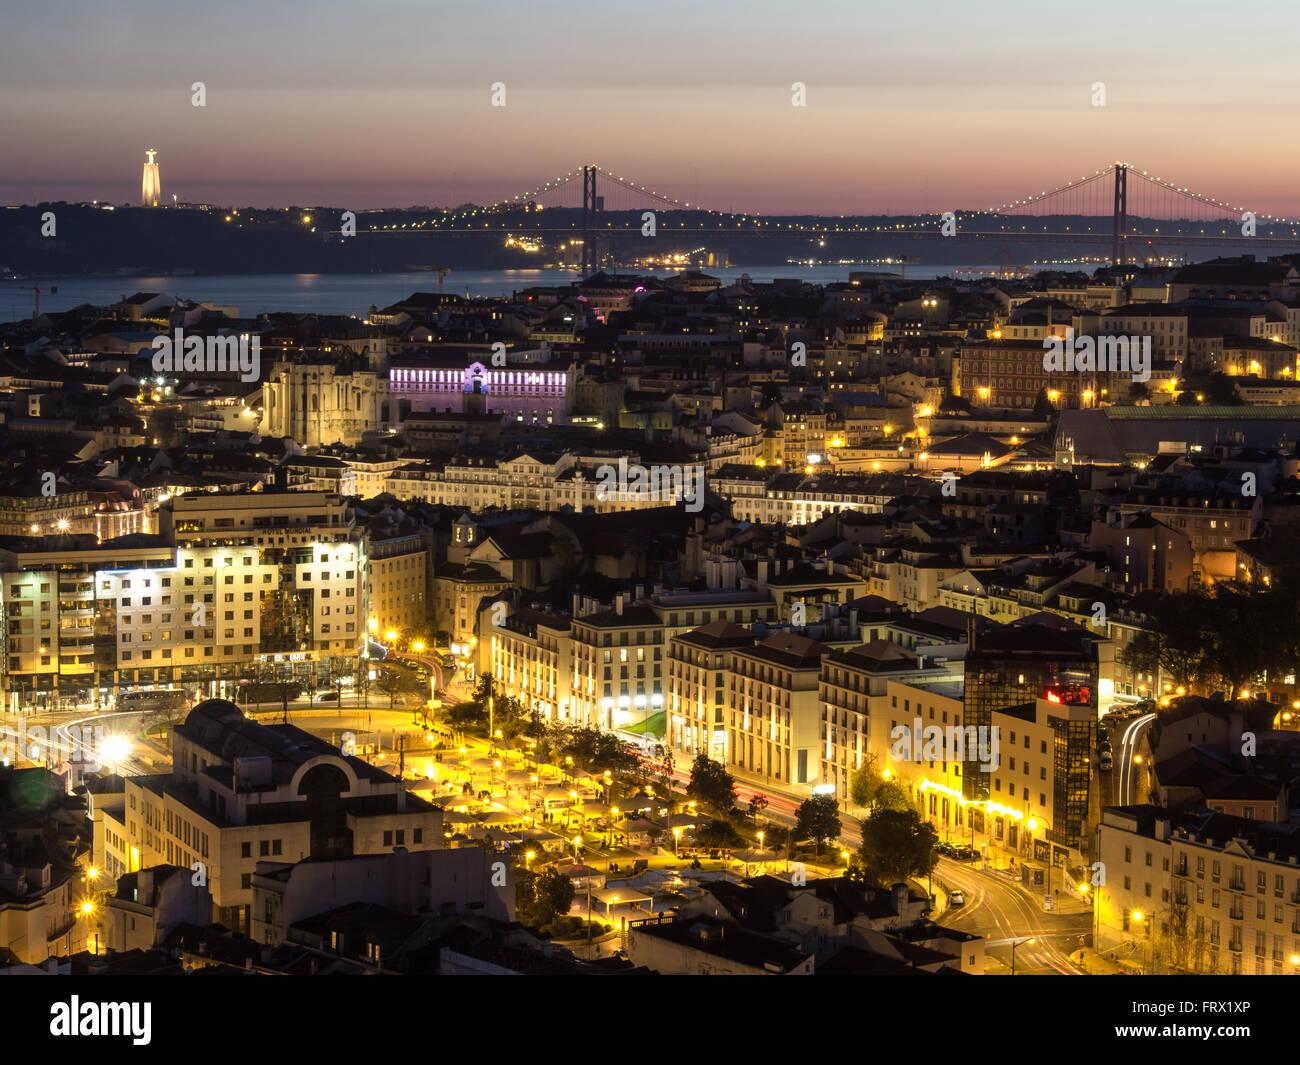 Beautiful view of Lisbon at night - Stock Image